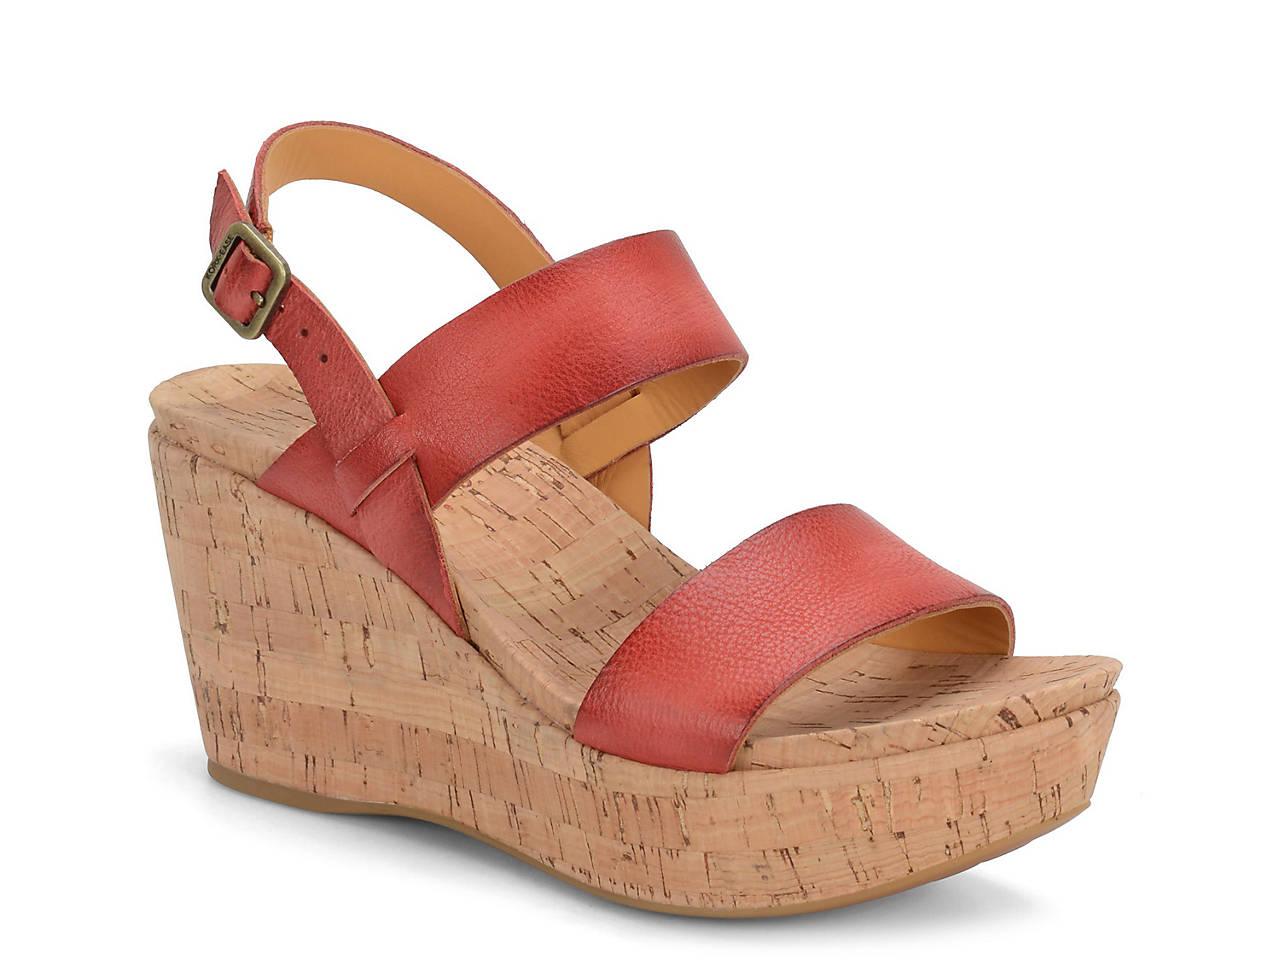 Kork-Ease Austin Wedge Sandals CA4Kp